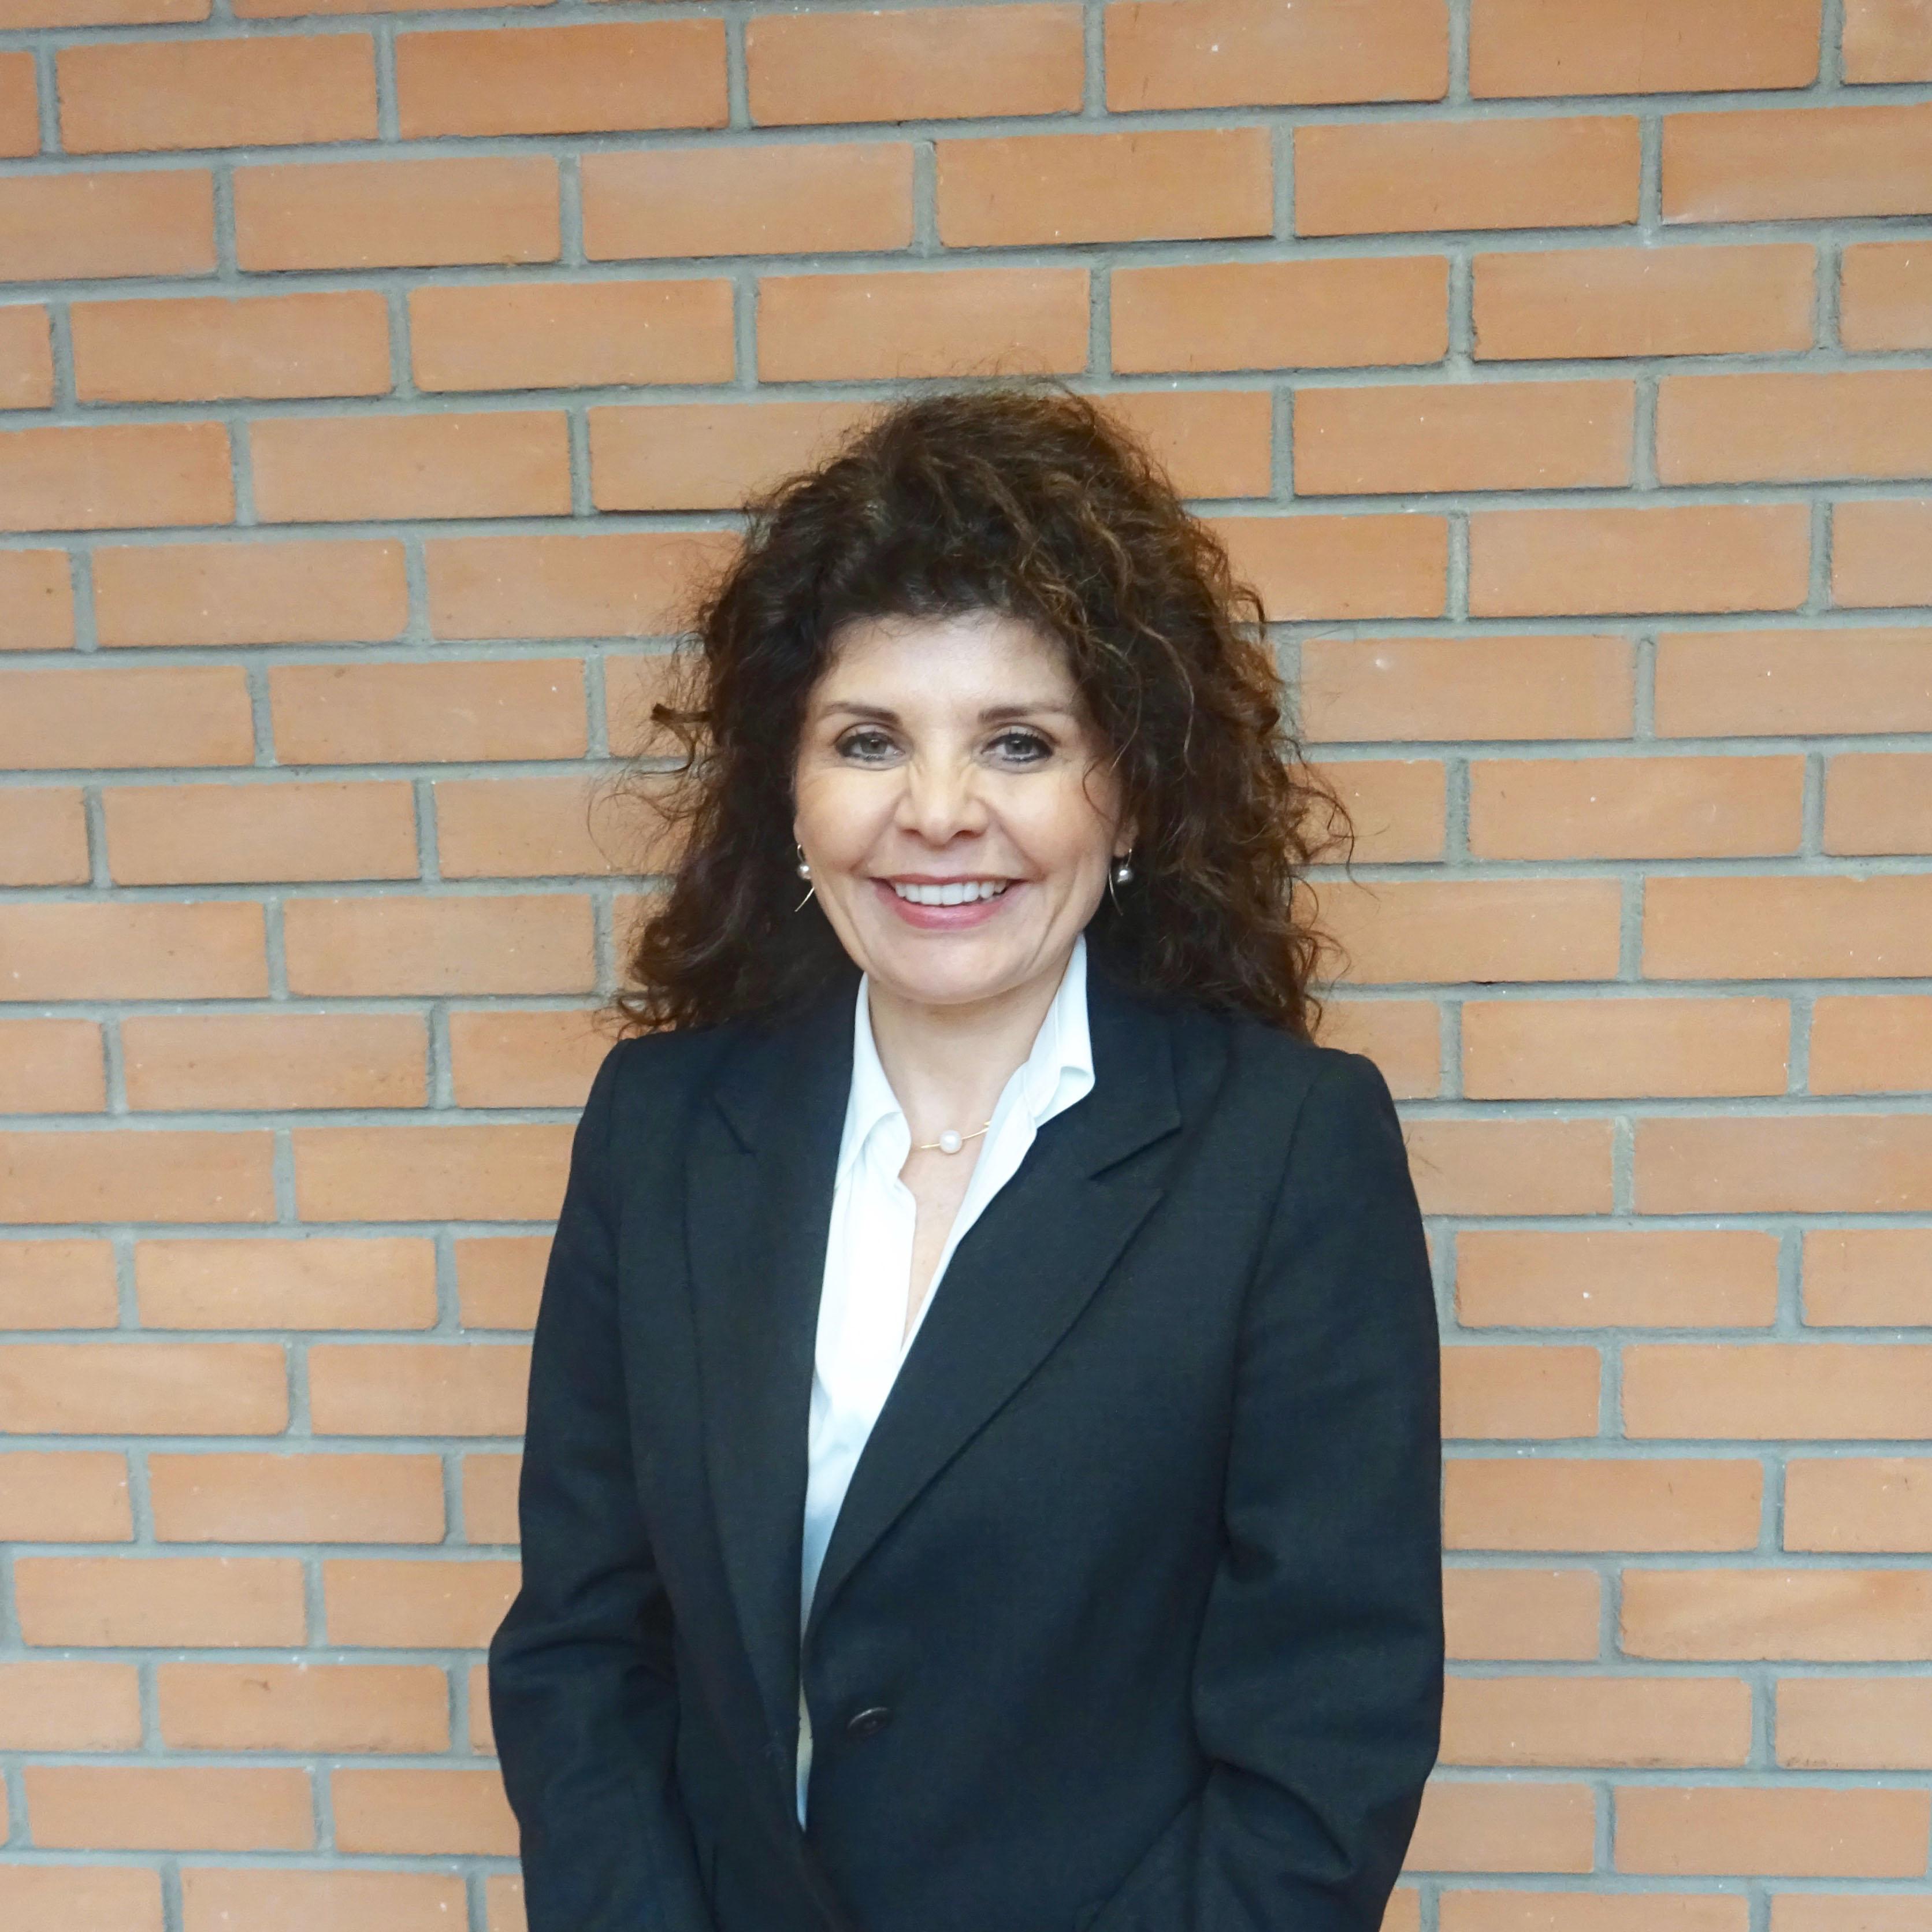 Rania Semertzian